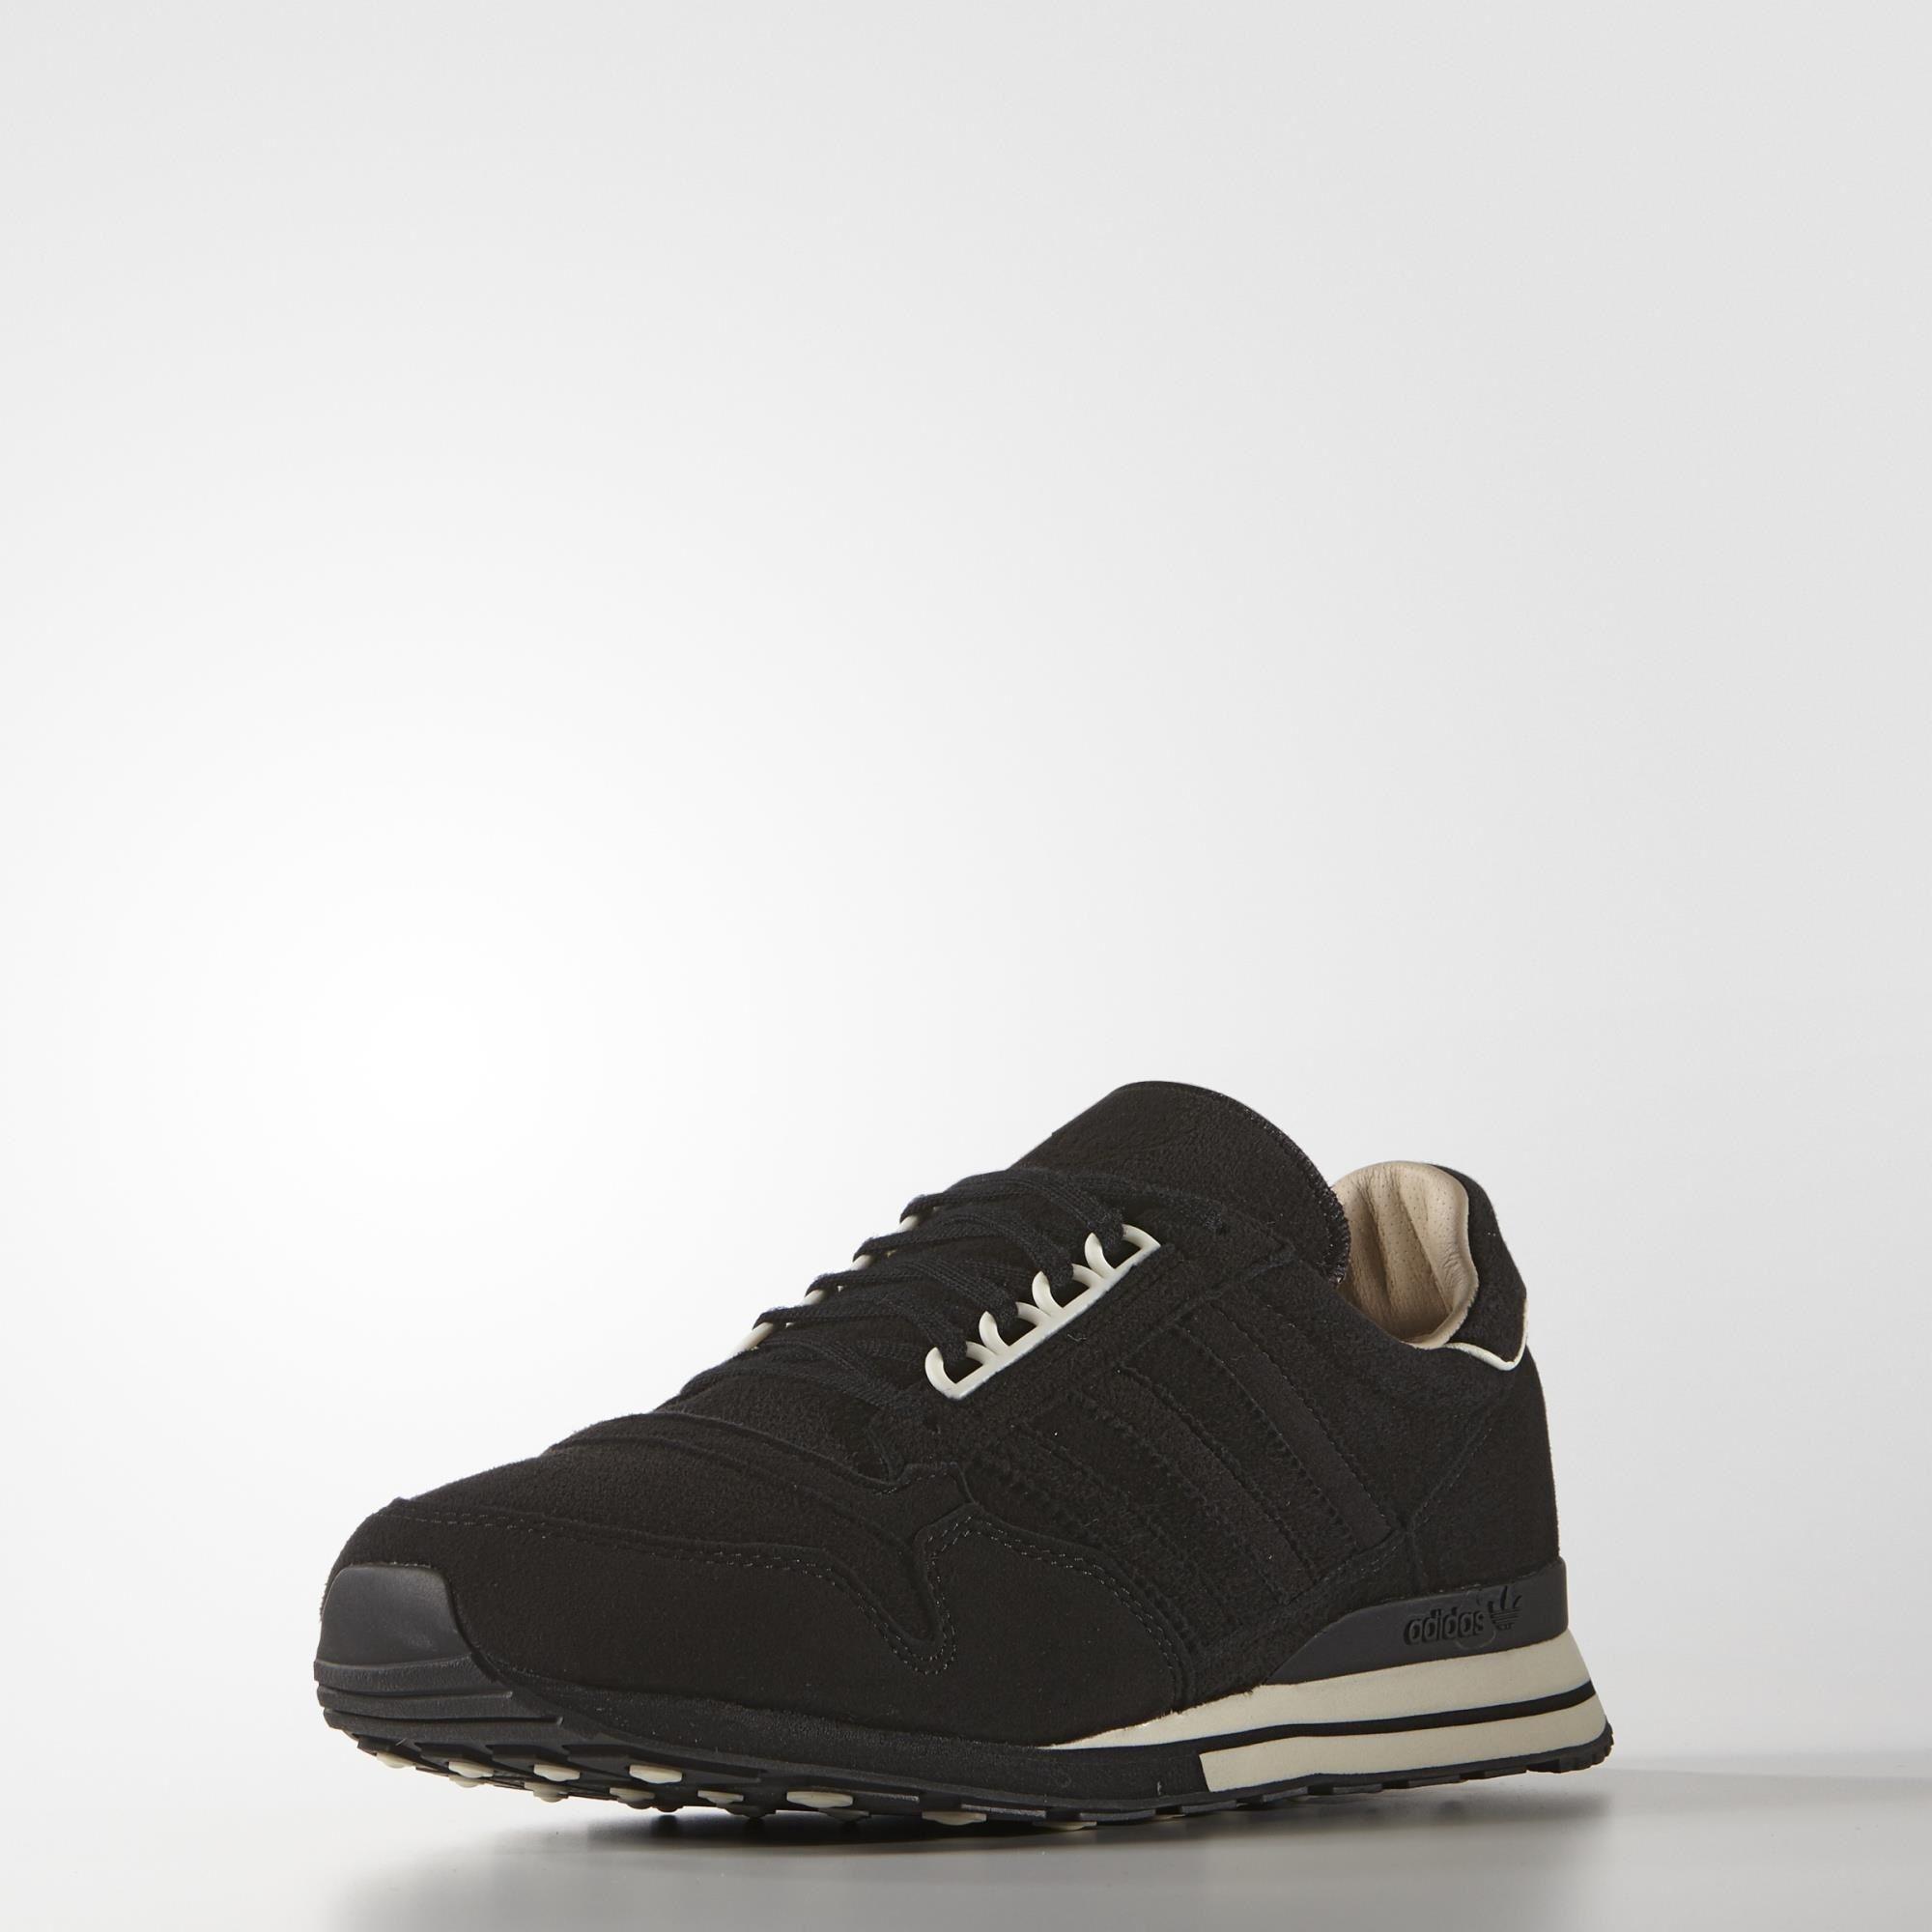 adidas ZX 500 OG Made In Germany Schuh schwarz   adidas